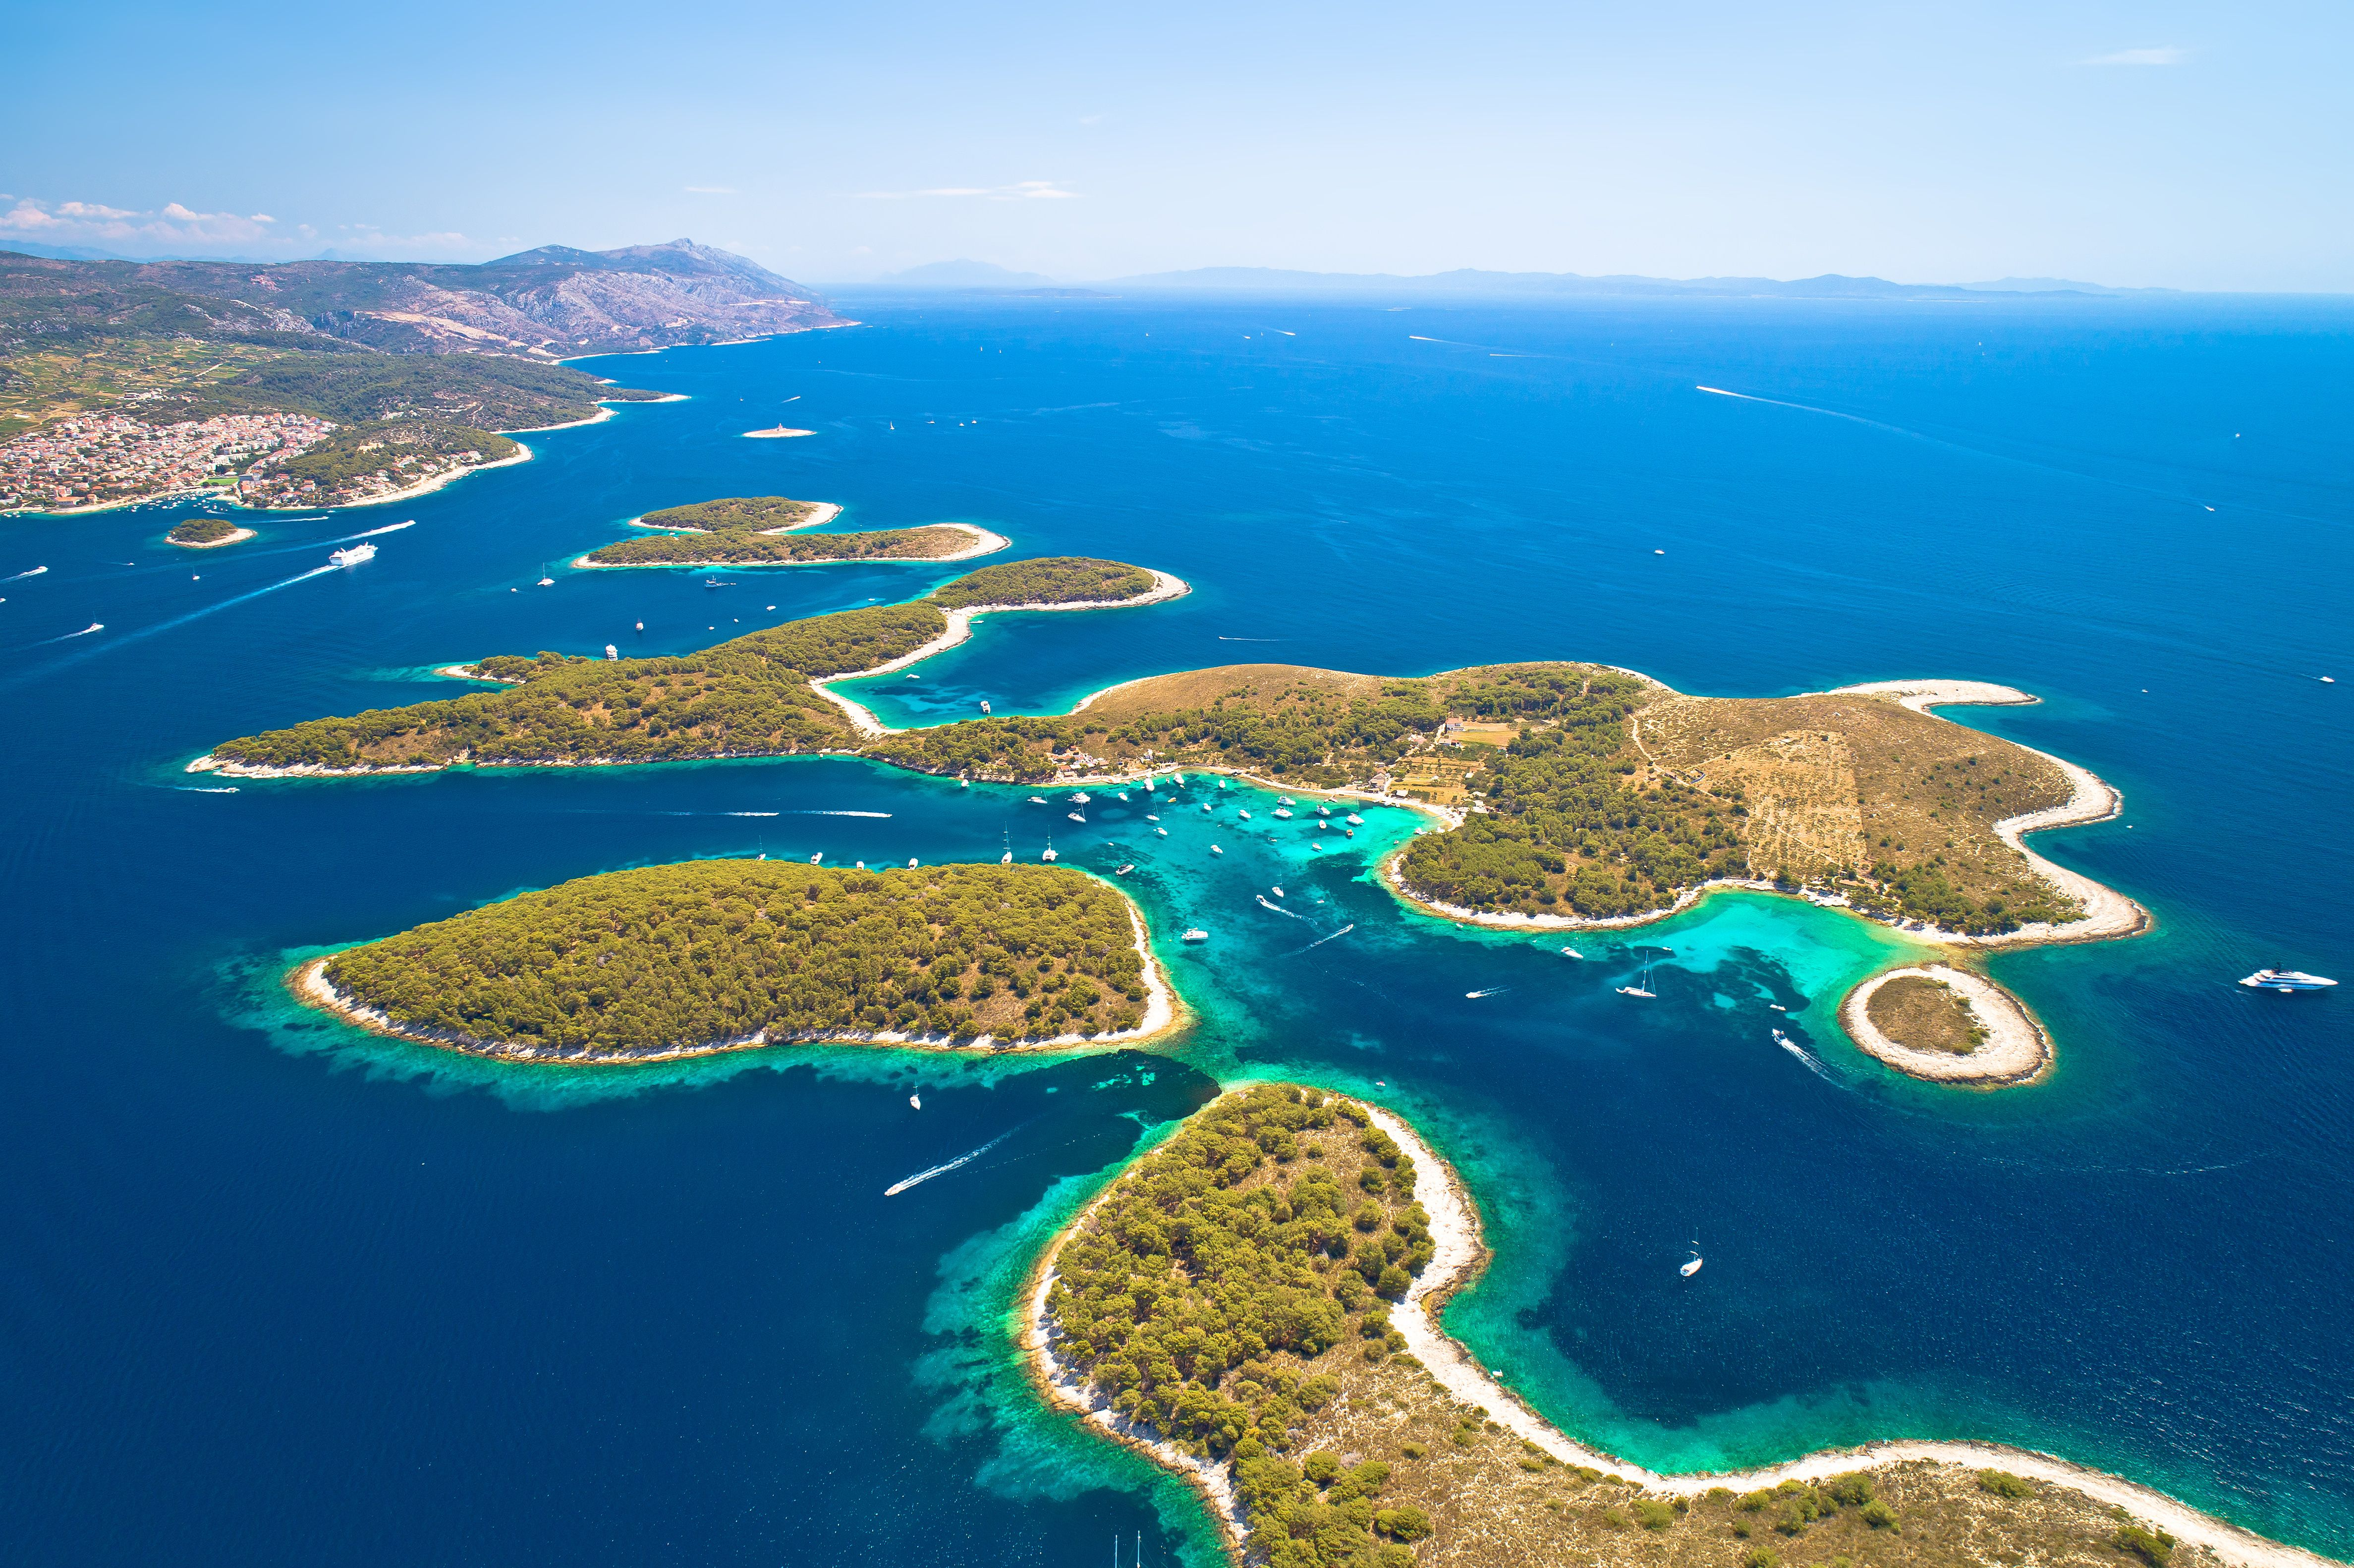 Dalmatiens Inseln per Yacht entdecken